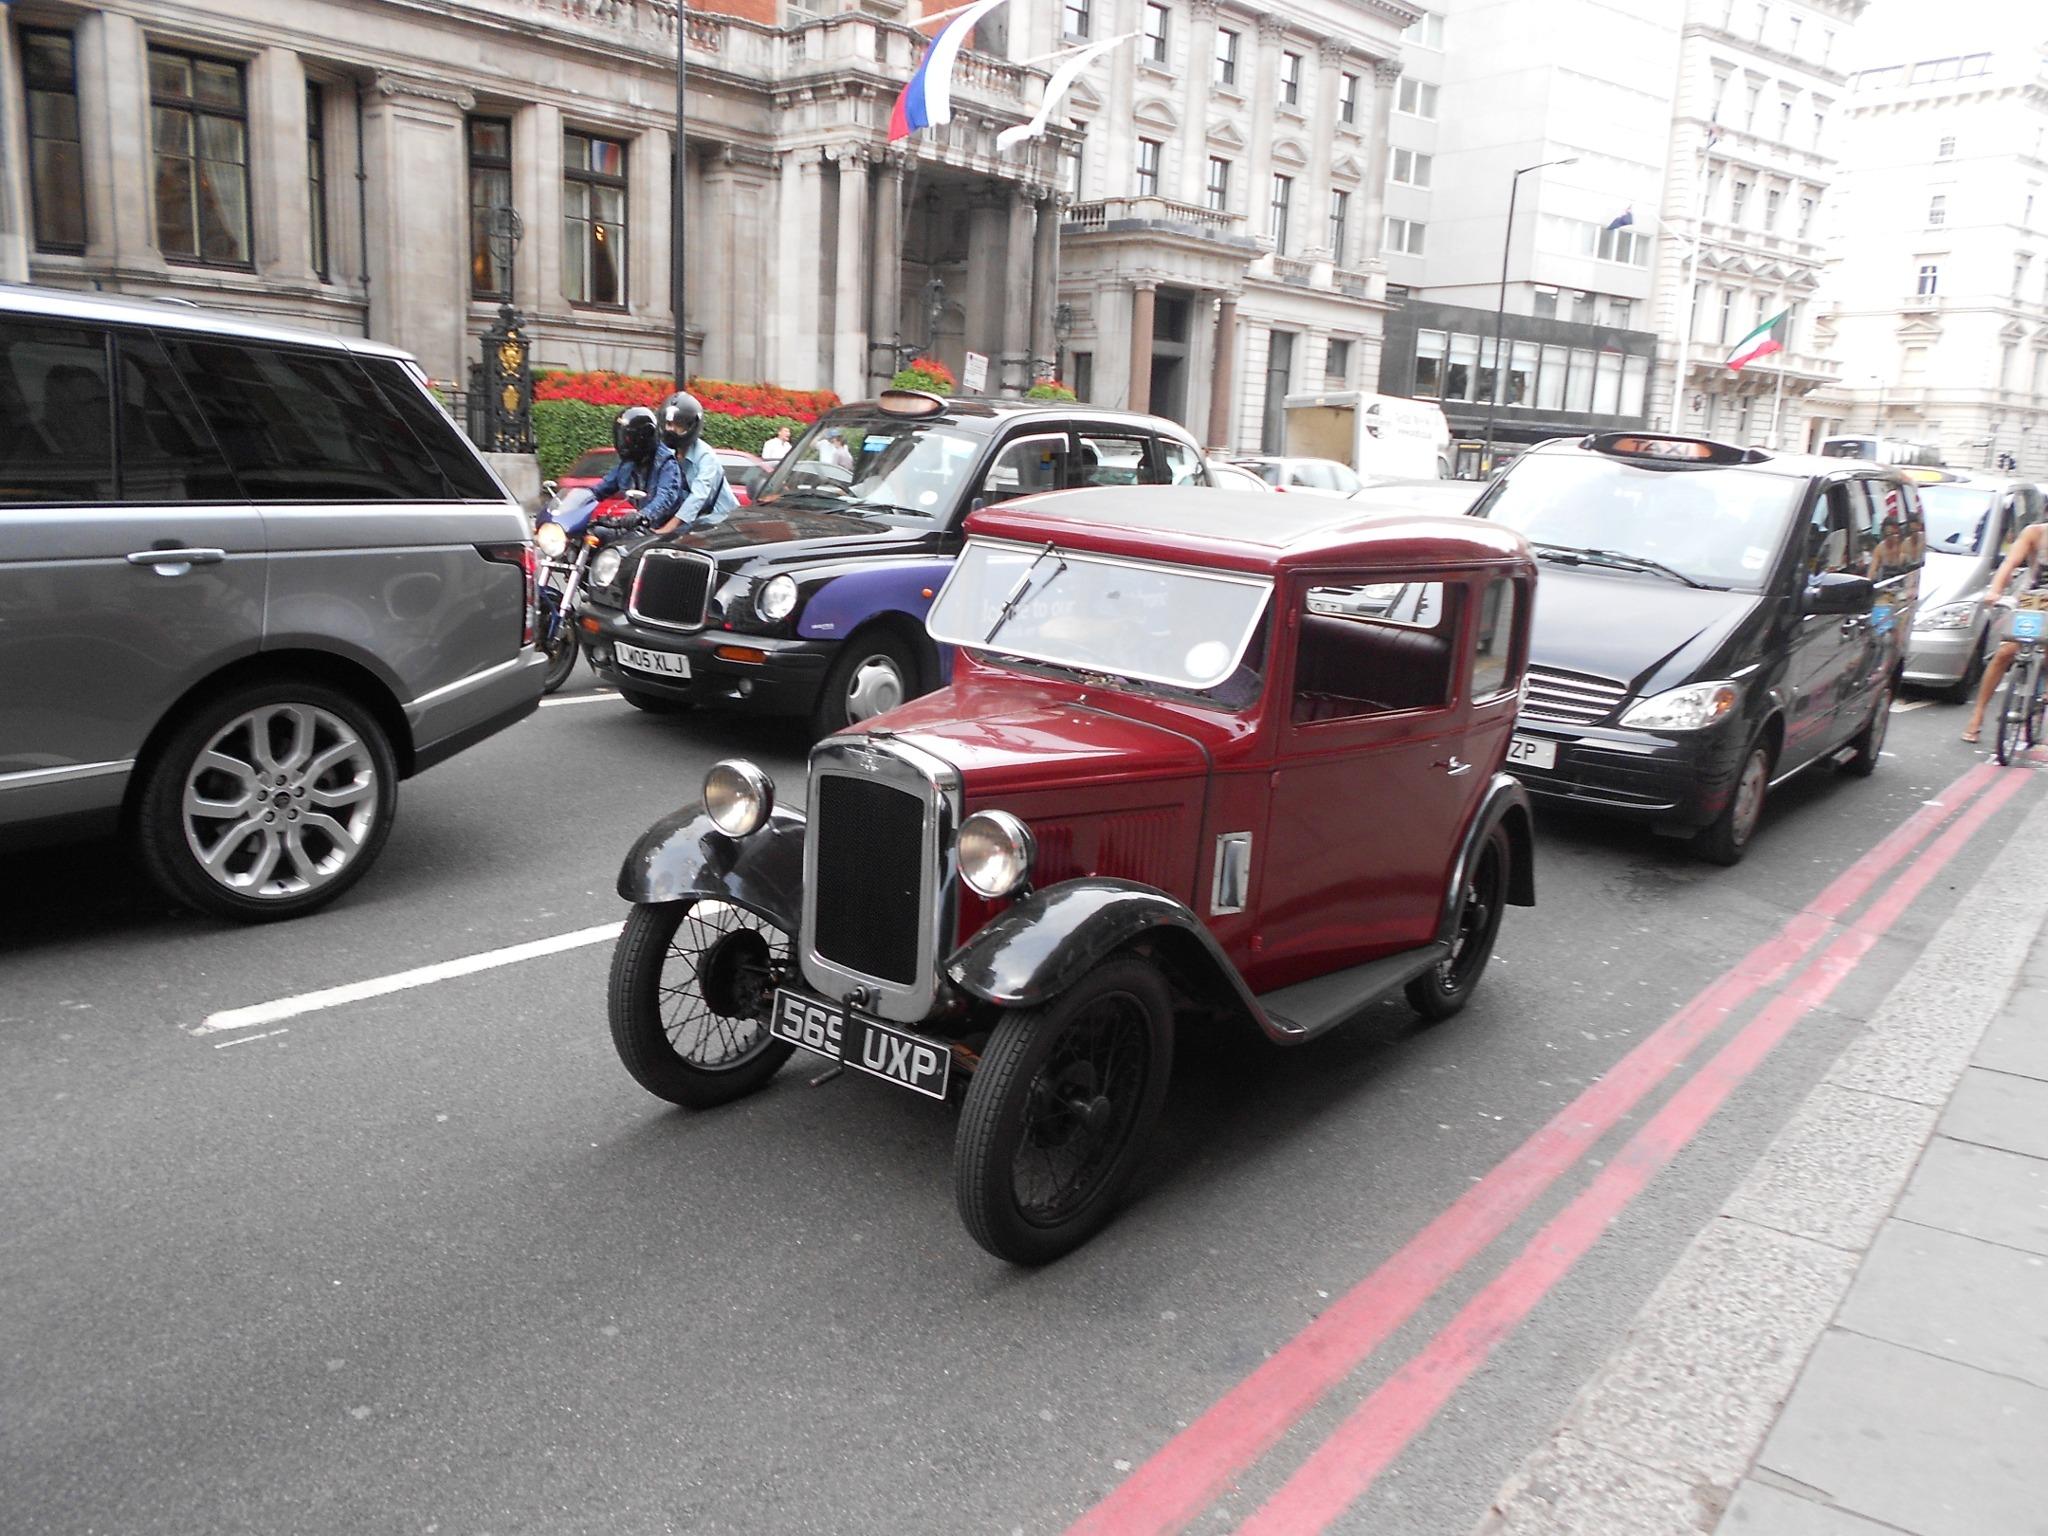 Austin Seven car